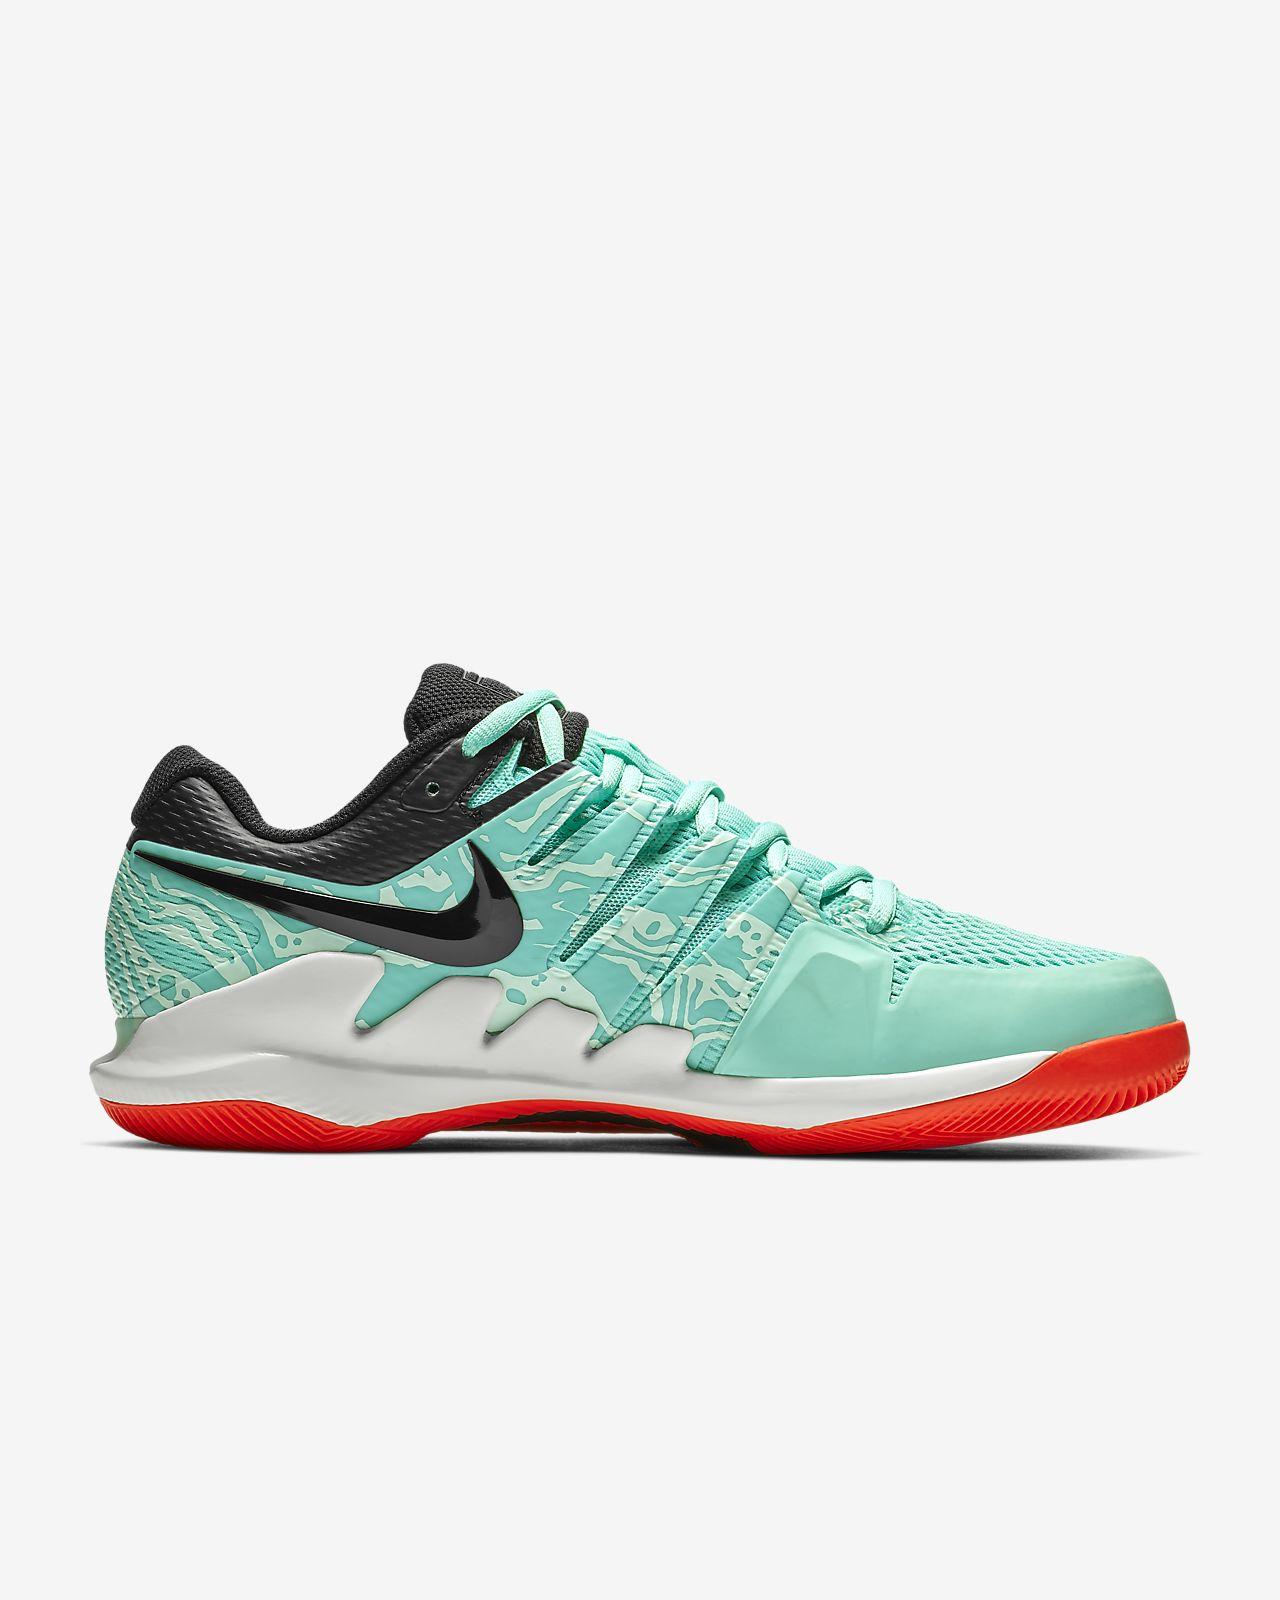 532f0b572 NikeCourt Air Zoom Vapor X Men s Hard Court Tennis Shoe. Nike.com ID